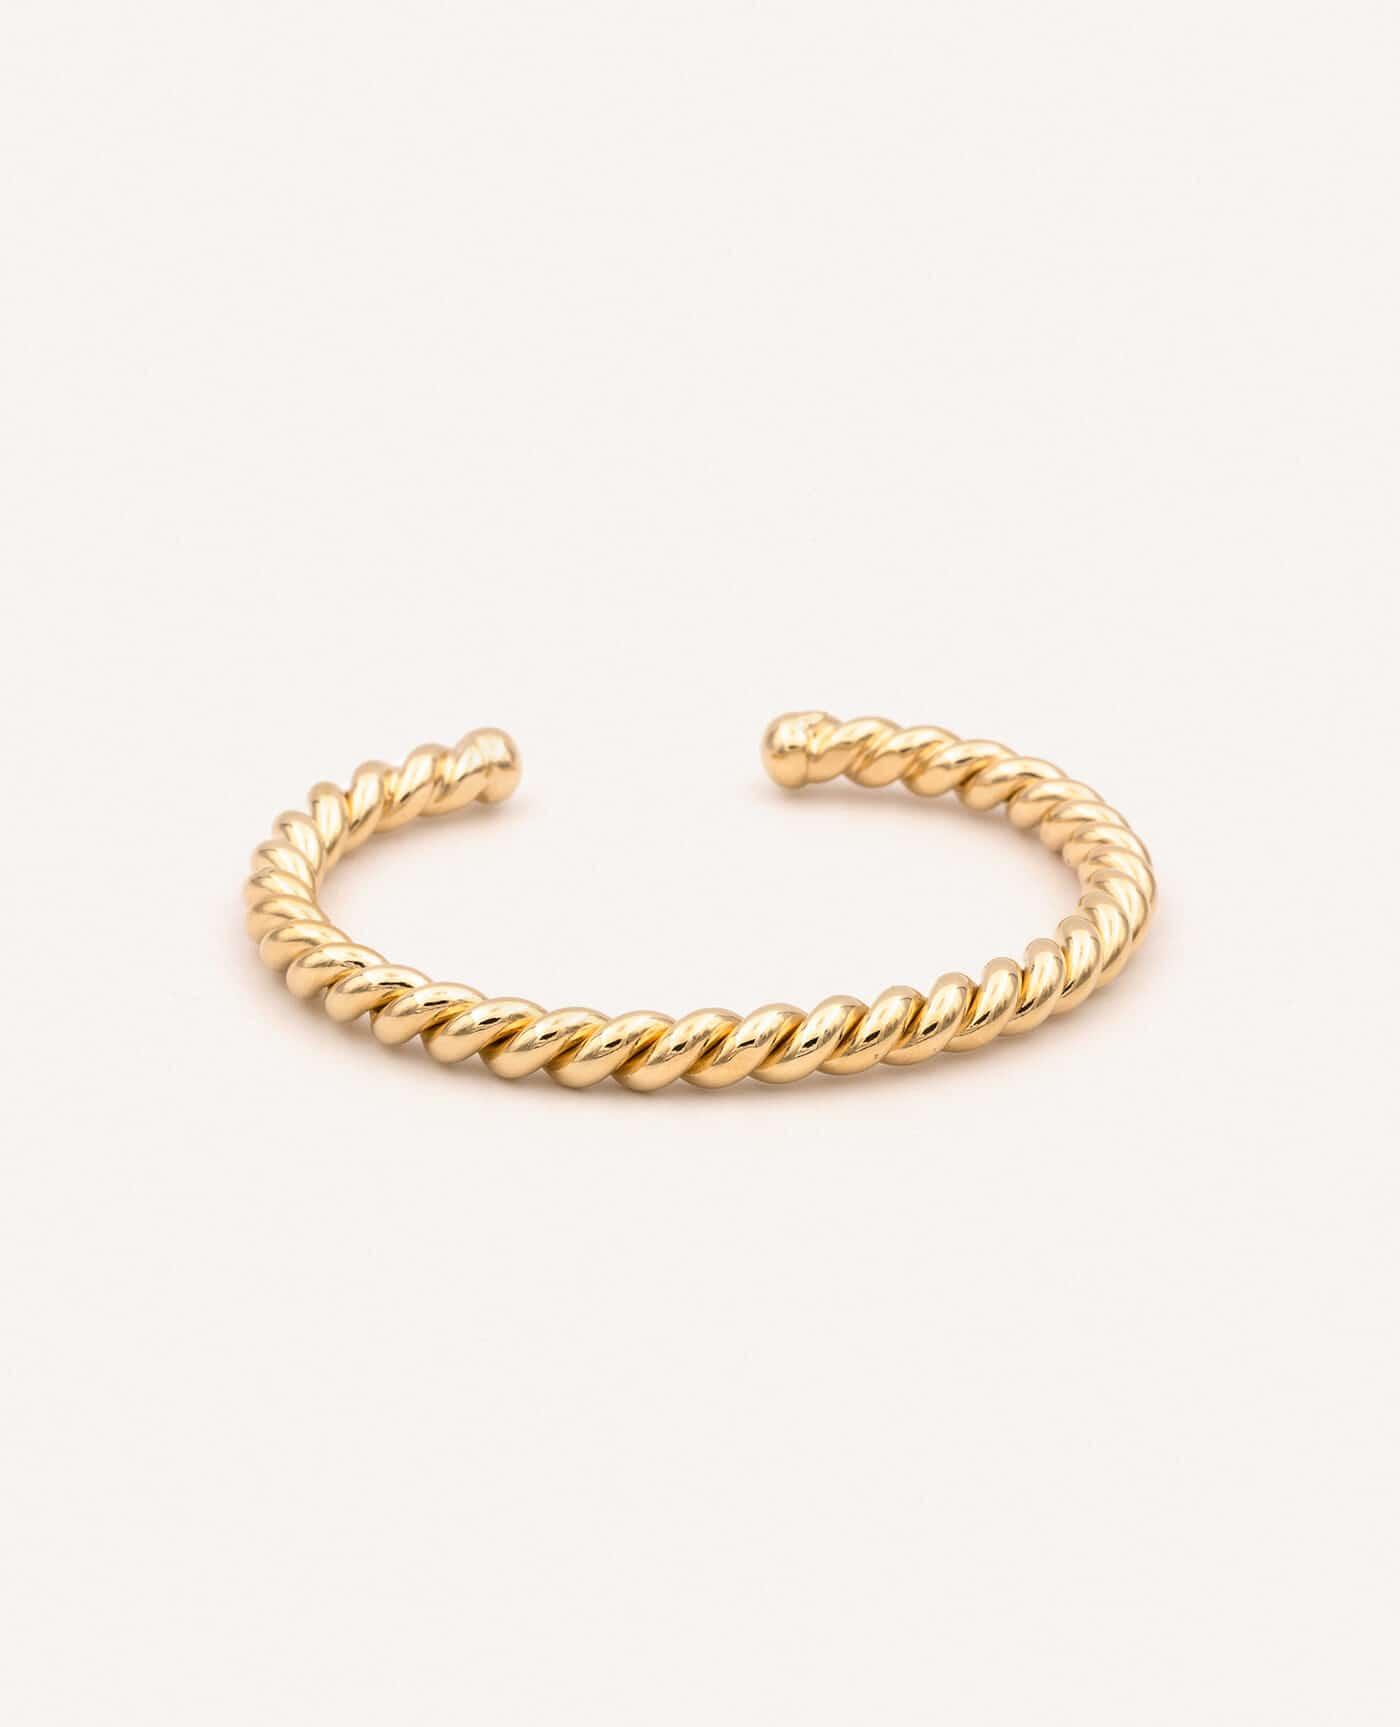 Bracelet Judith torsadé jonc 2 tresses de la marque Luj Paris